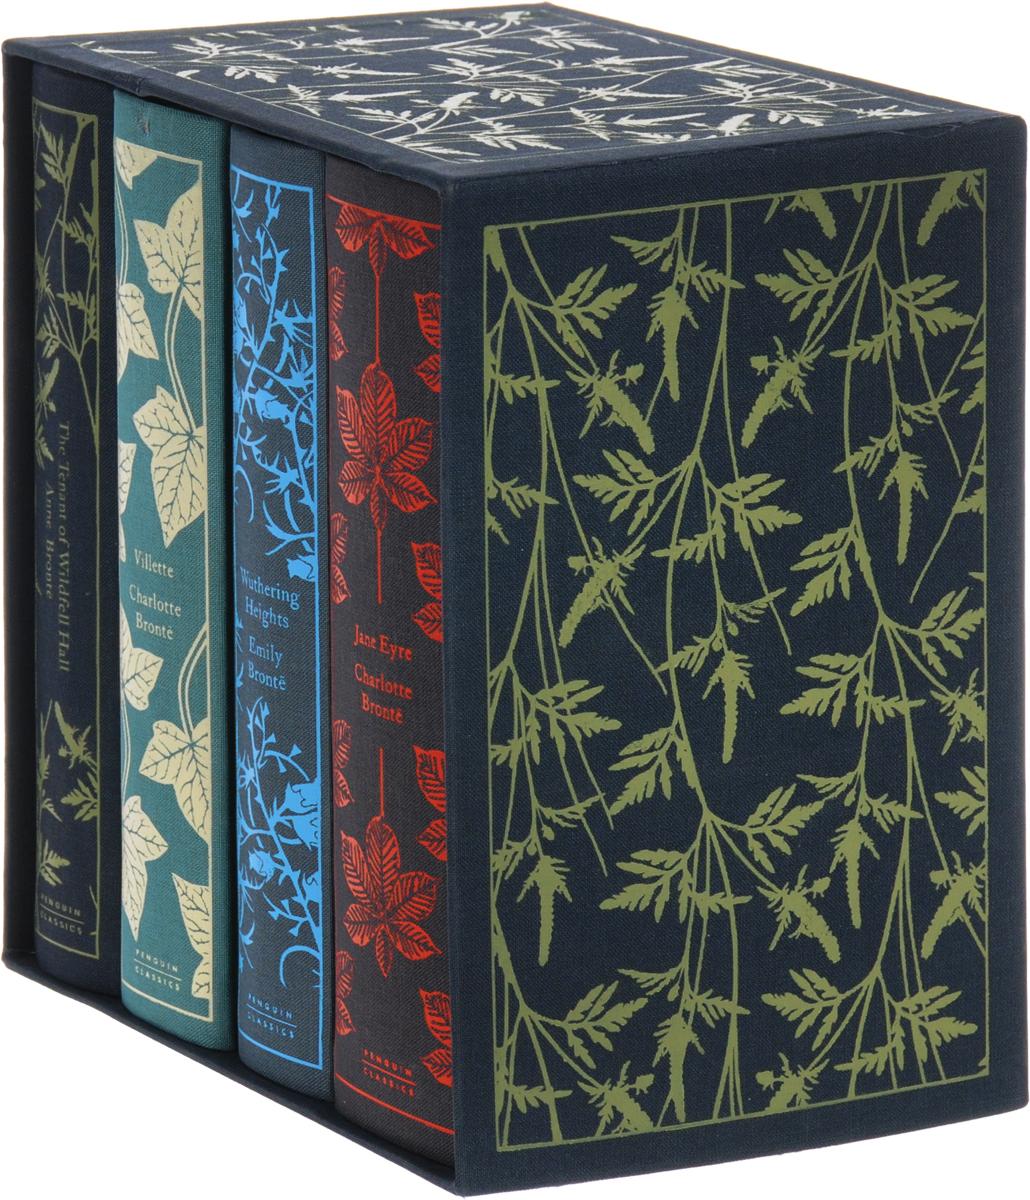 The Bronte Sisters (комплект из 4 книг) воблер tsuribito pike hunter s цвет бирюзовый серый 572 длина 95 мм вес 22 5 г